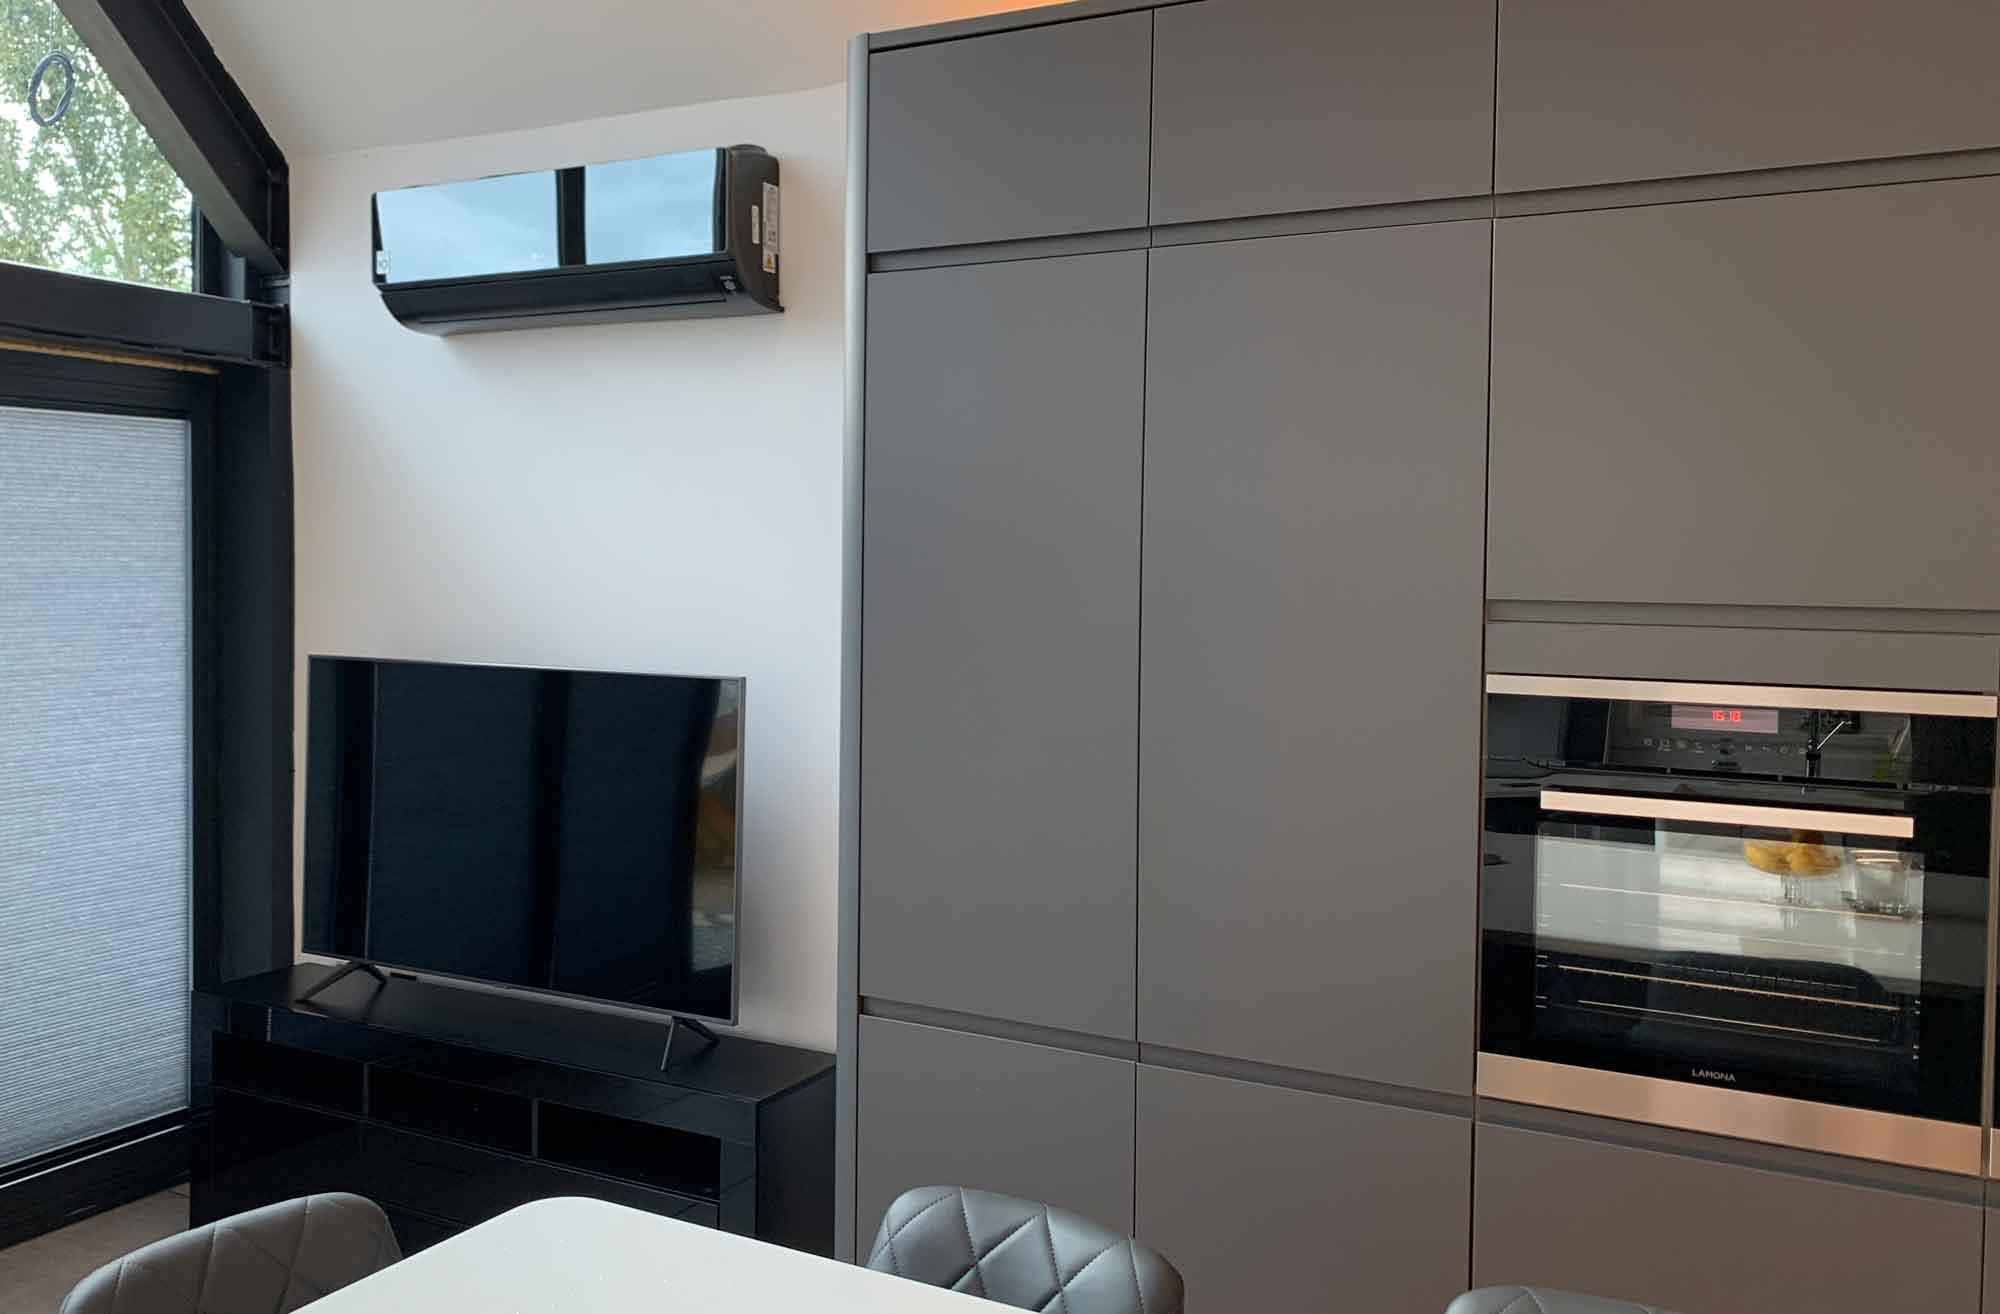 Sparta Mech air conditioning split system